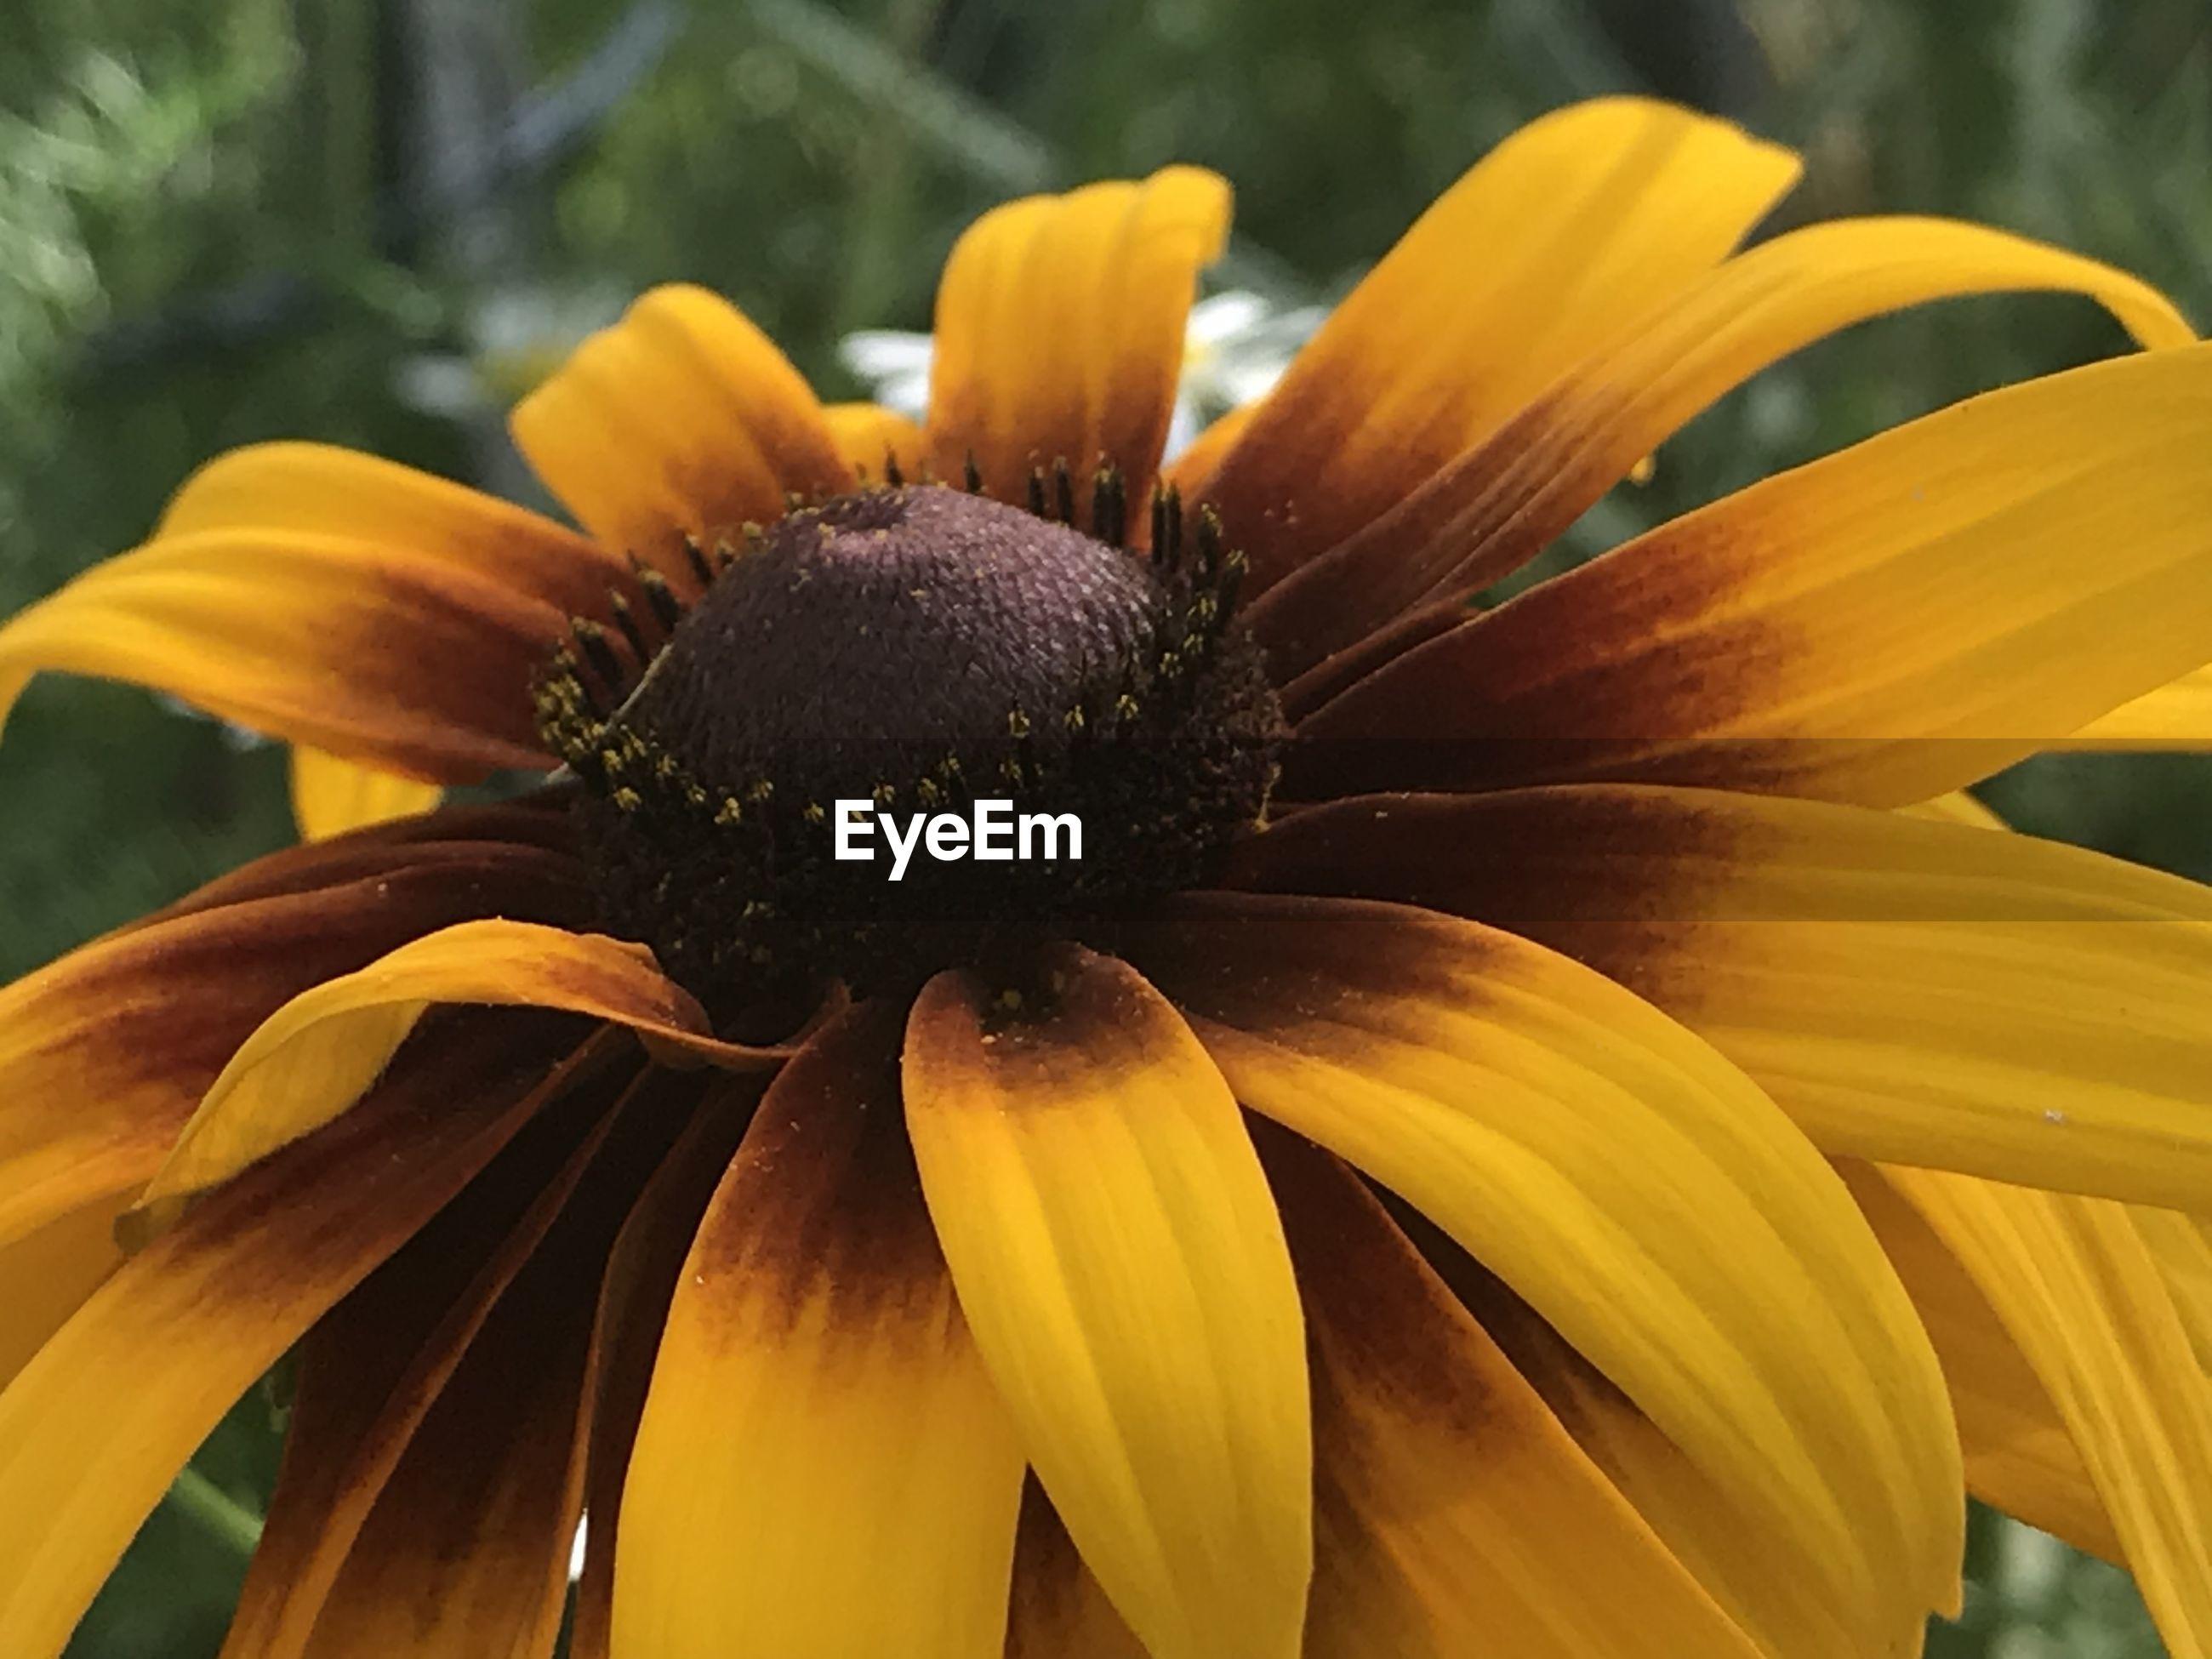 CLOSE-UP OF YELLOW POLLEN ON ORANGE FLOWER